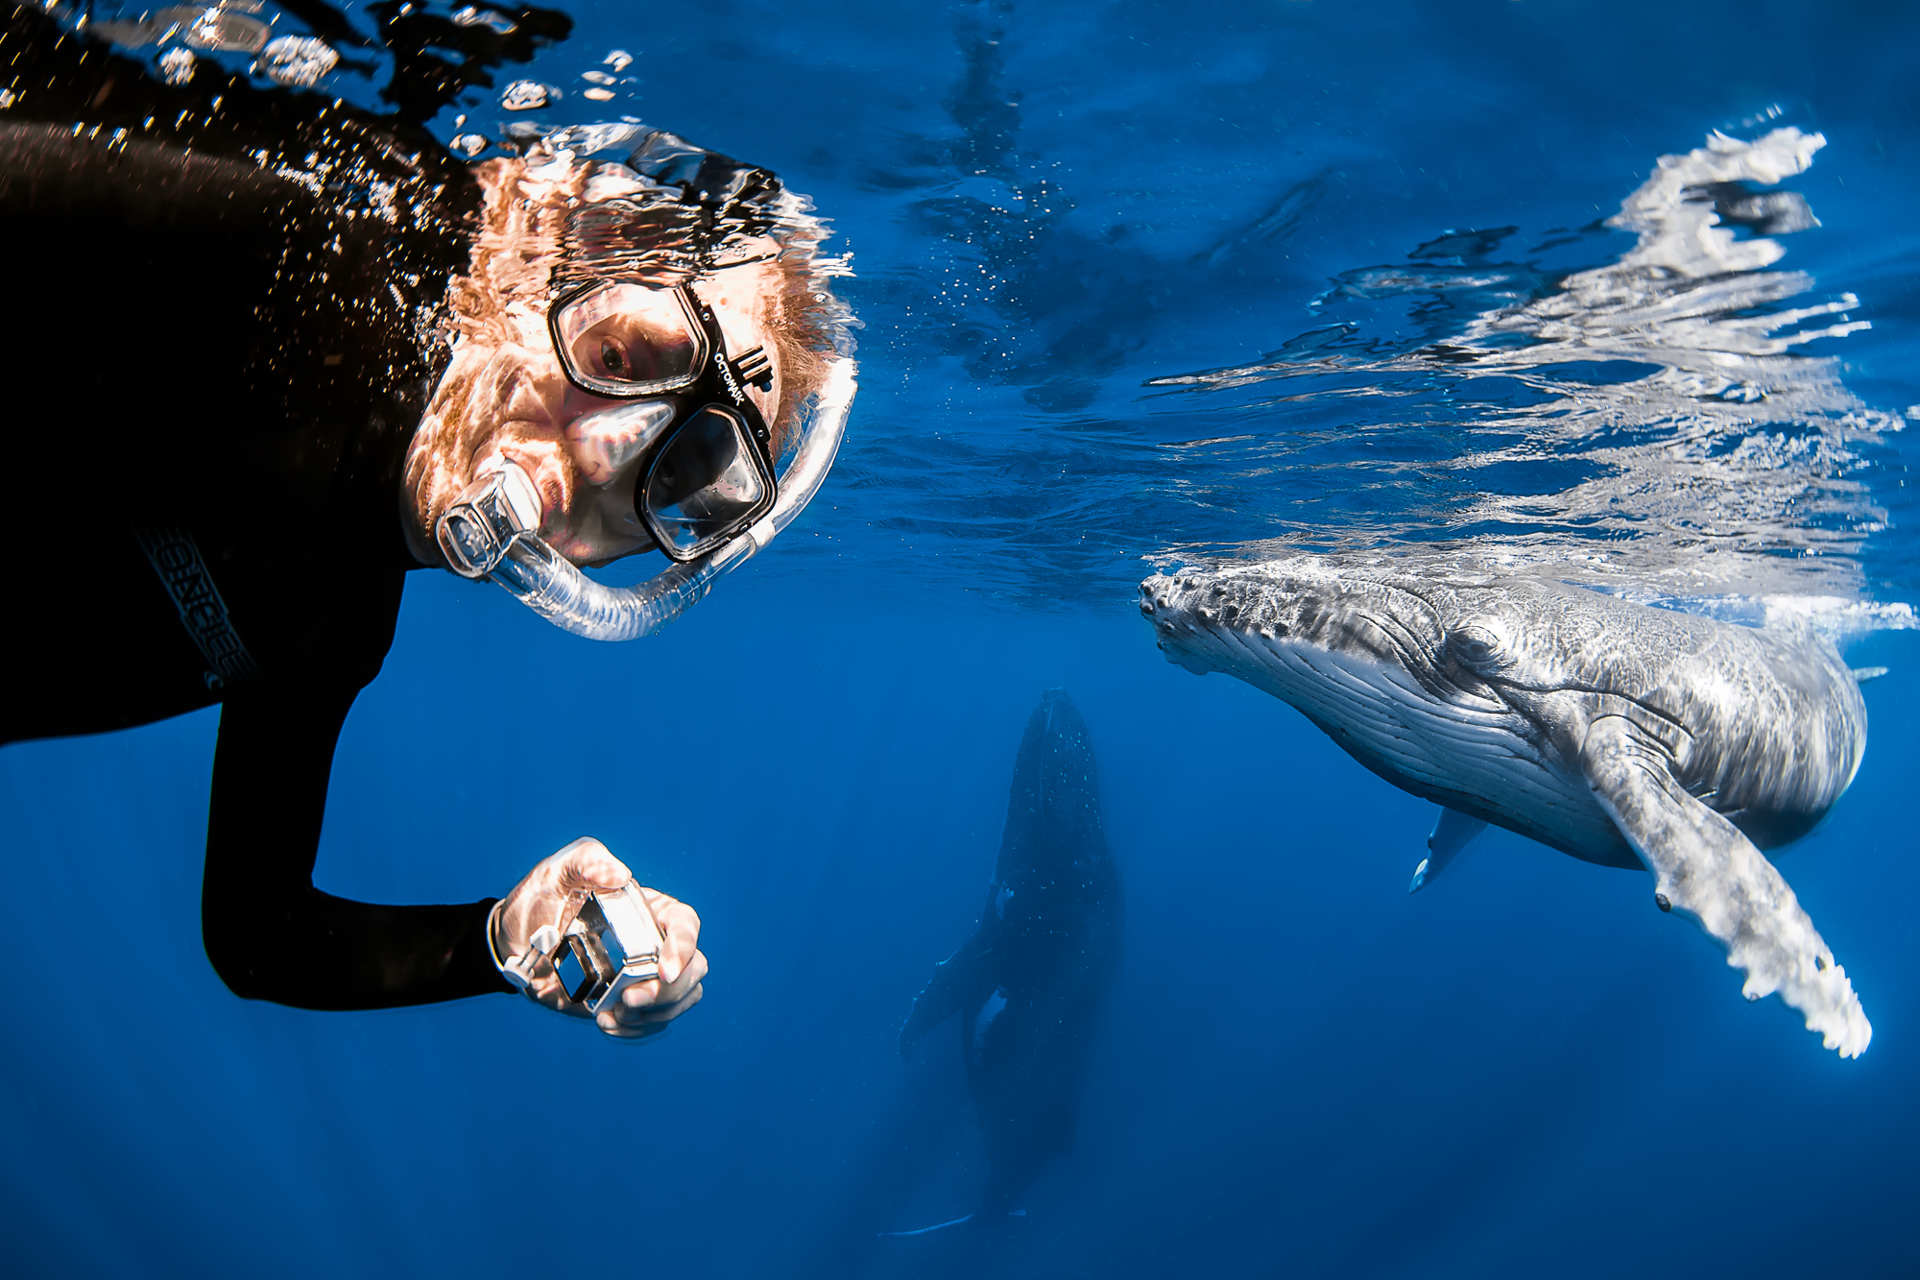 snorkeling with humpback whales in Vava'u, Tonga